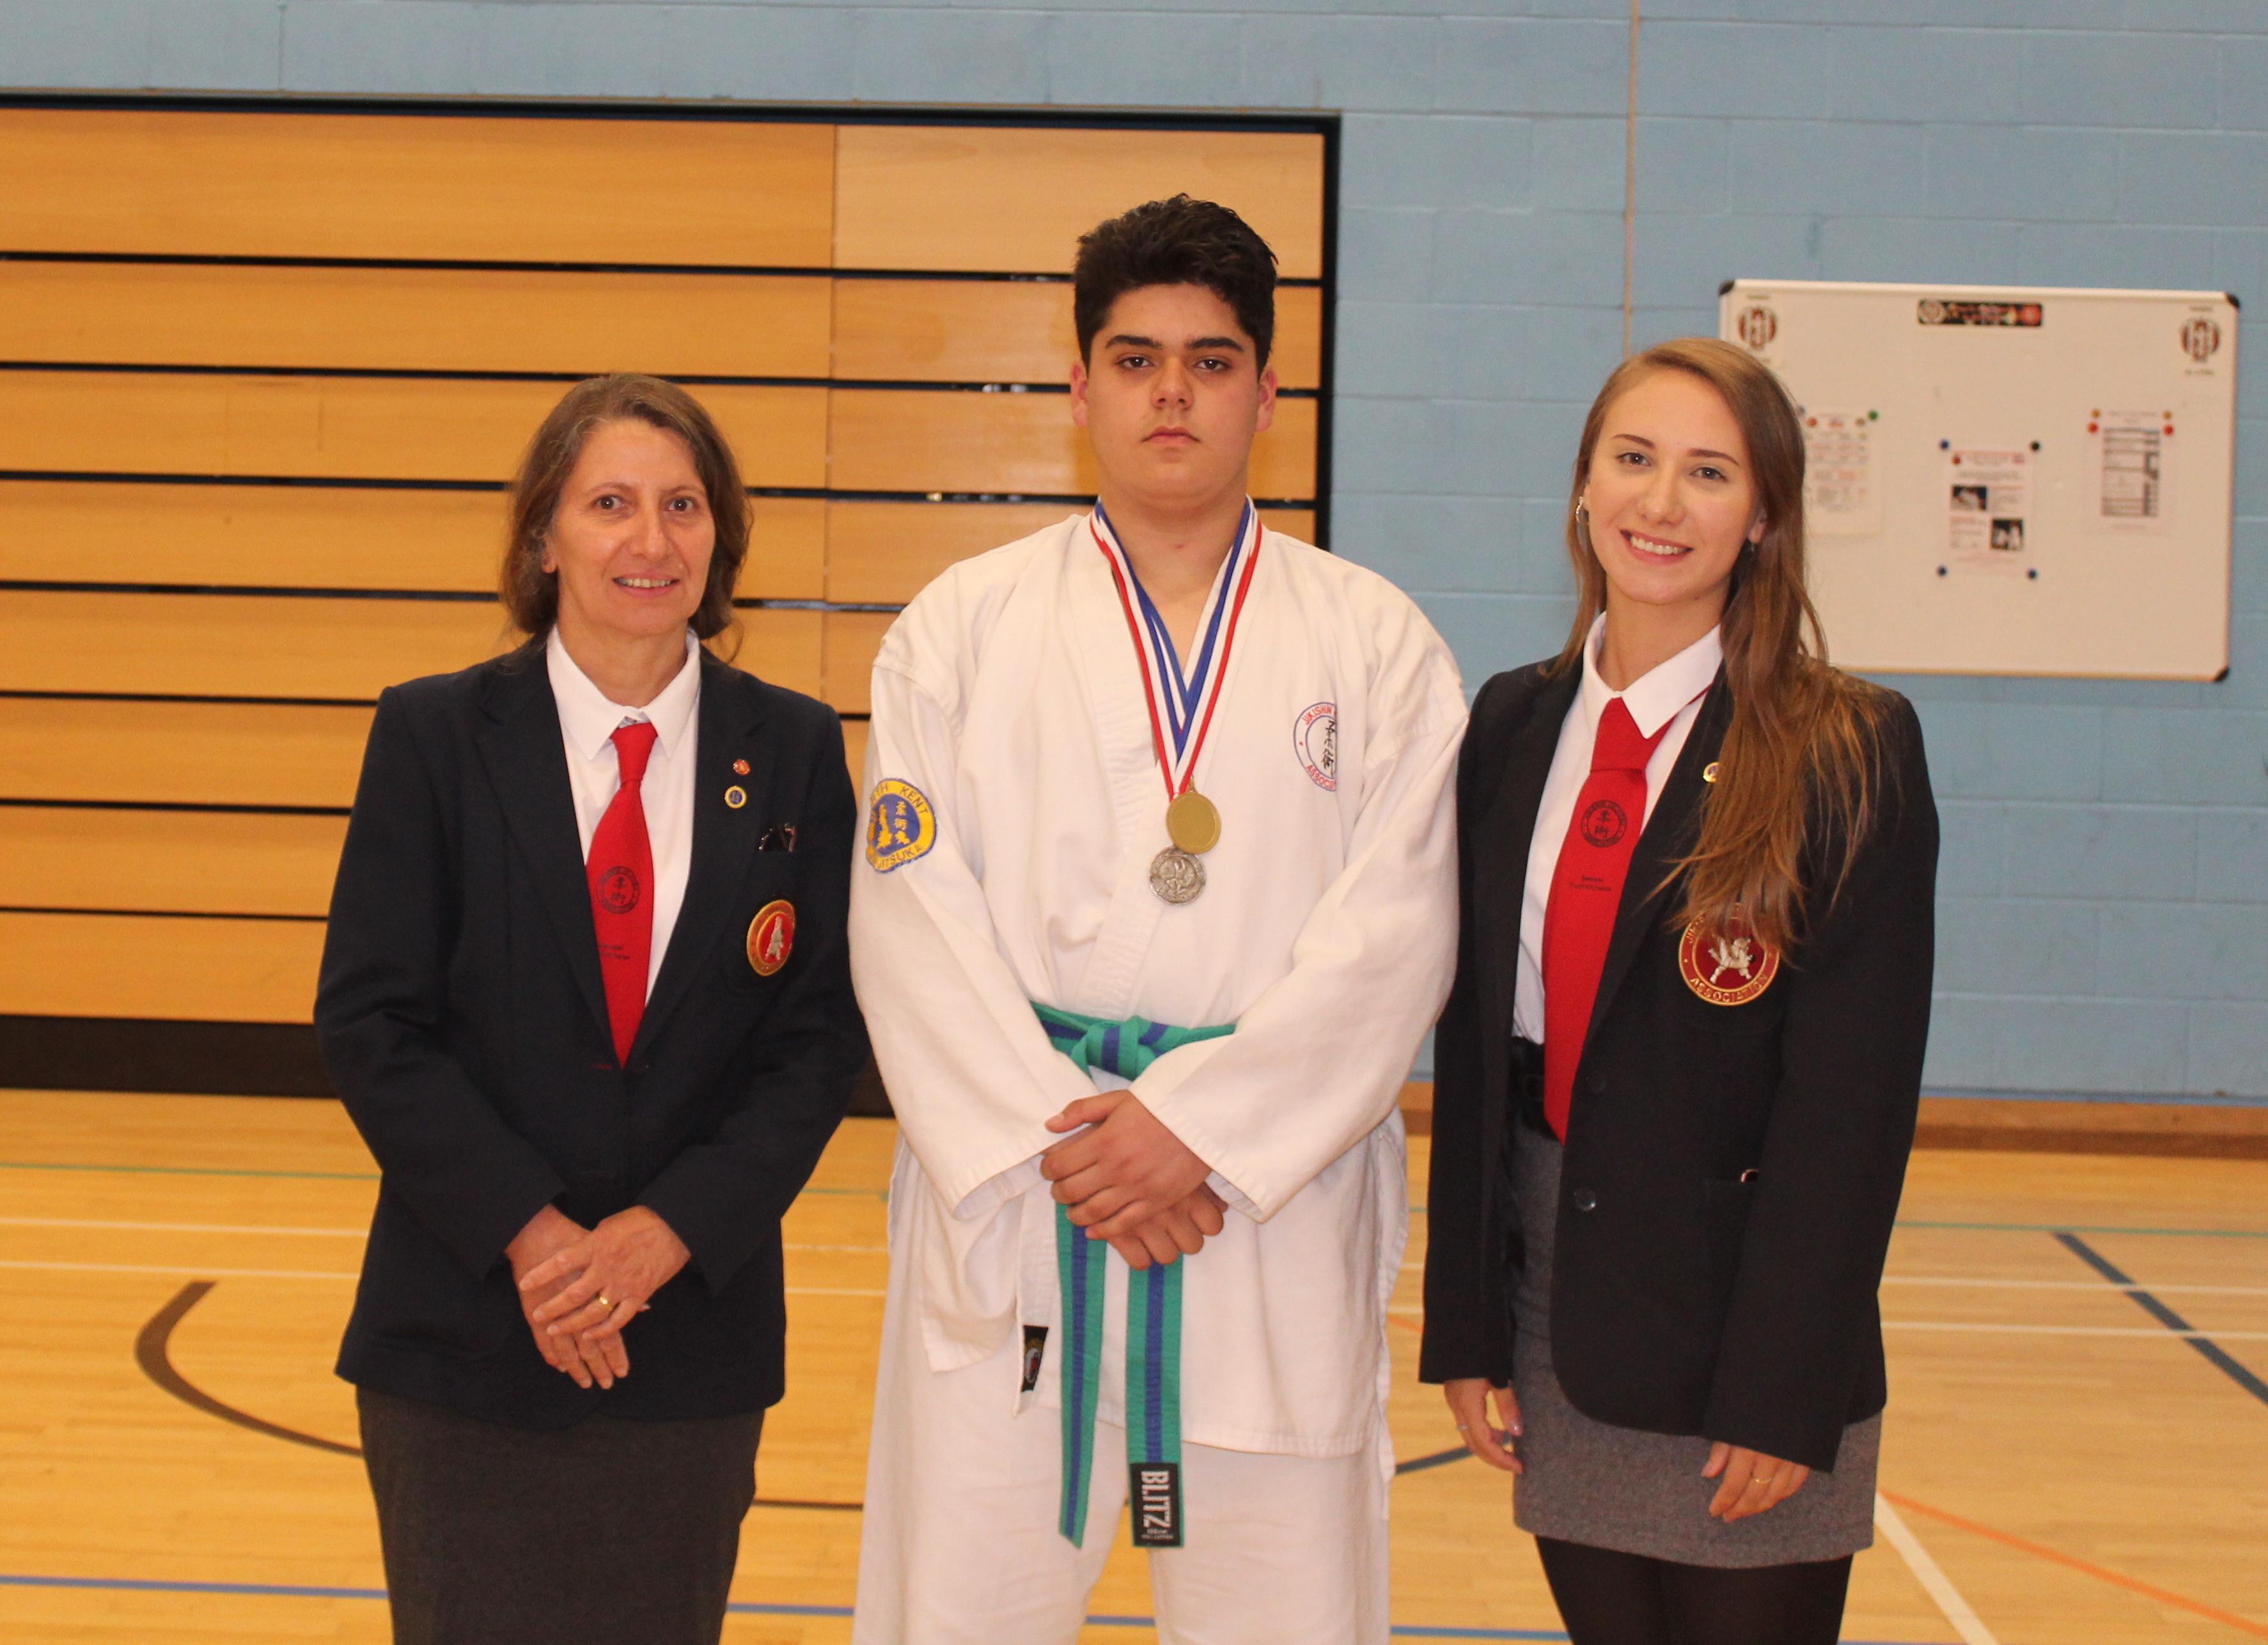 North Kent Ju-Jitsu Kai student winning silver and gold medals